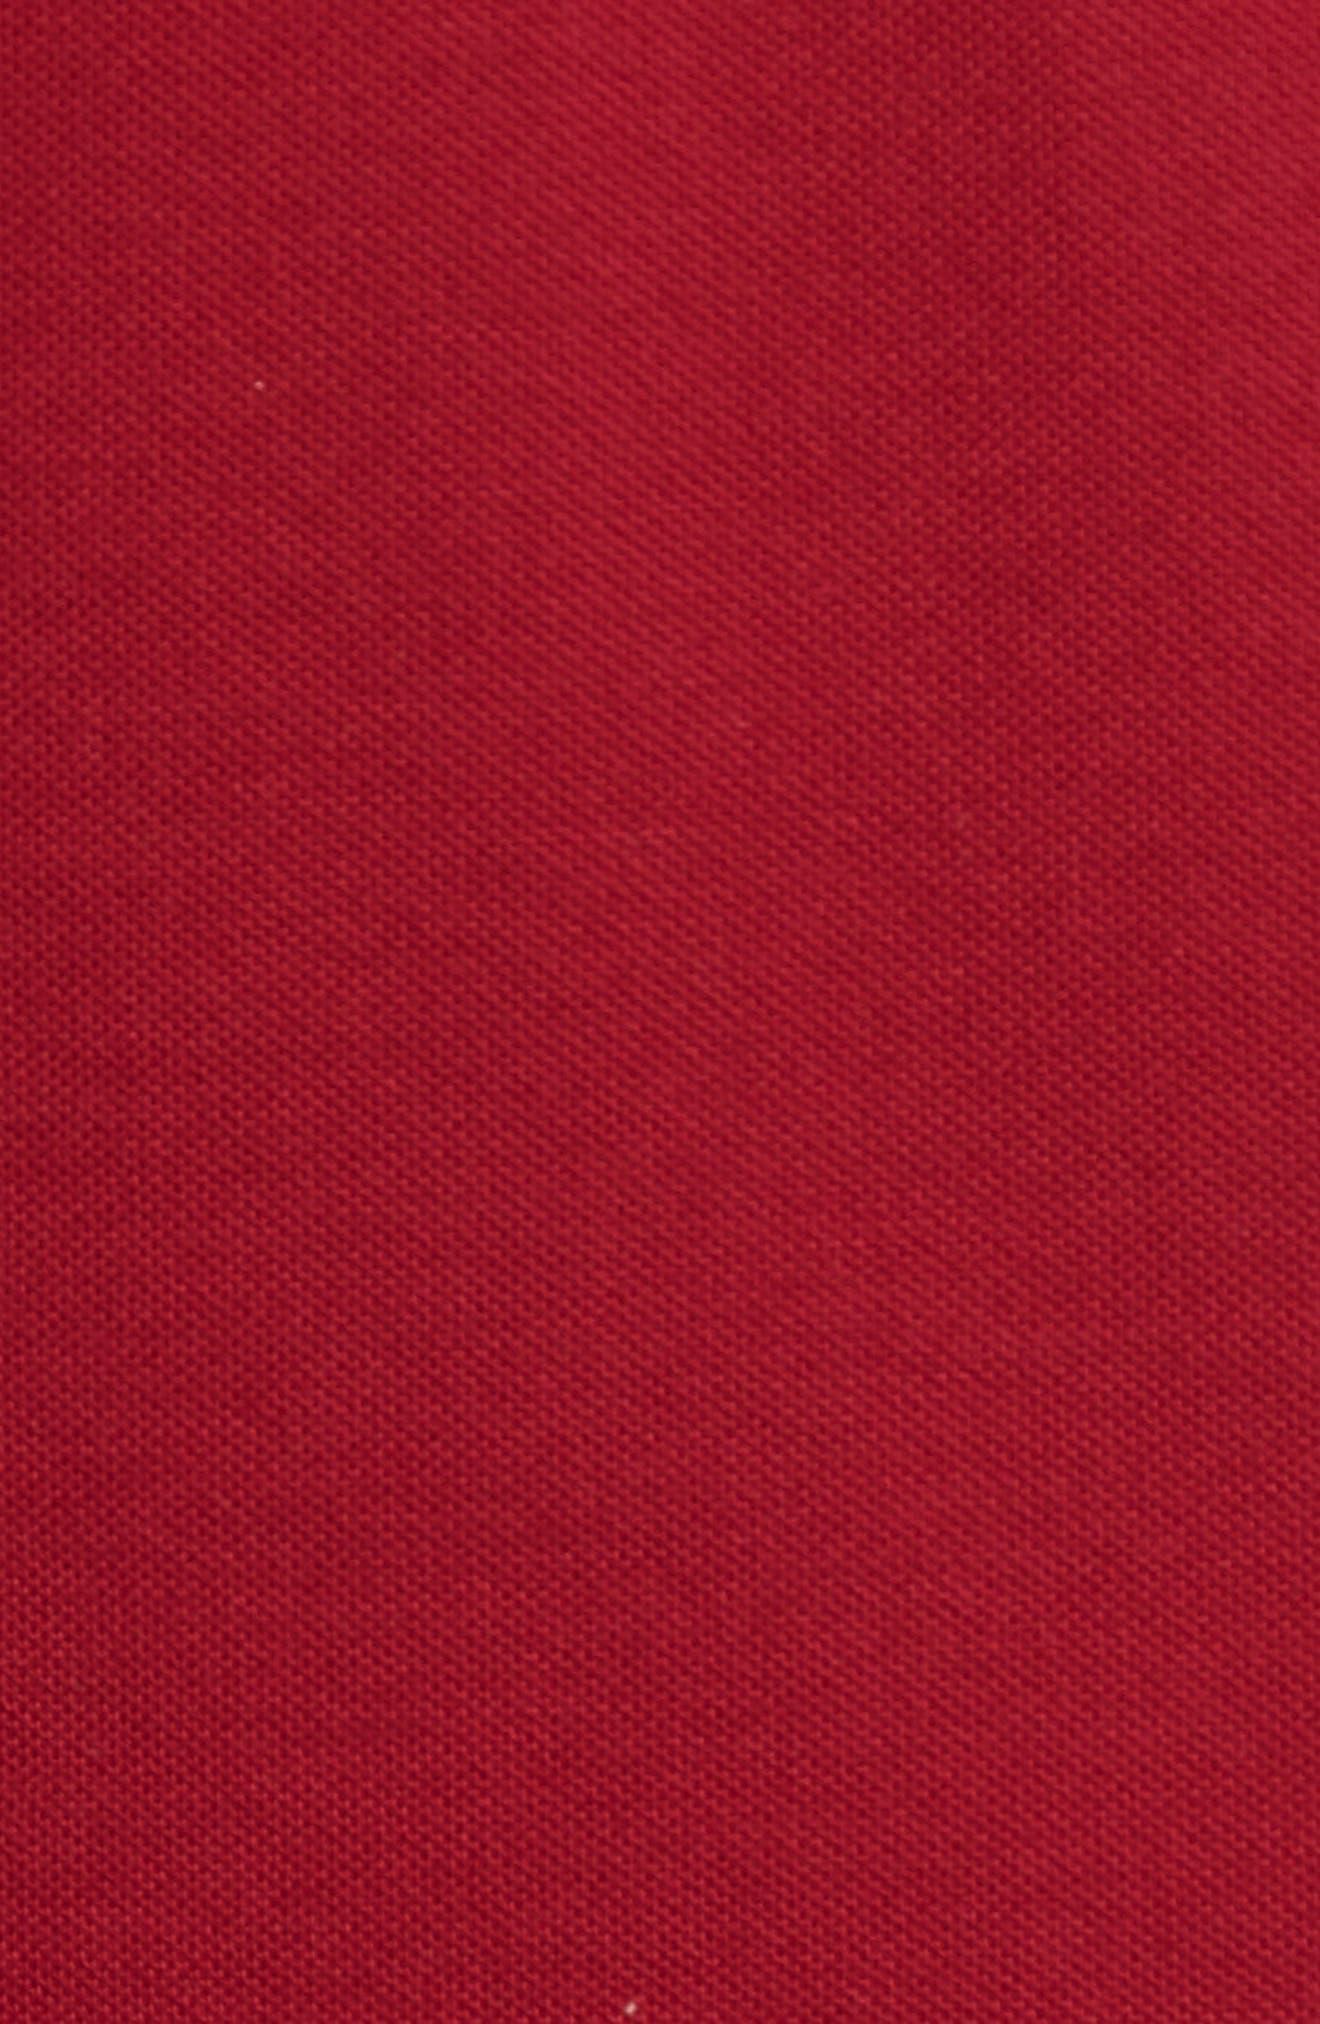 Regular Fit Pocket Piqué Polo,                             Alternate thumbnail 38, color,